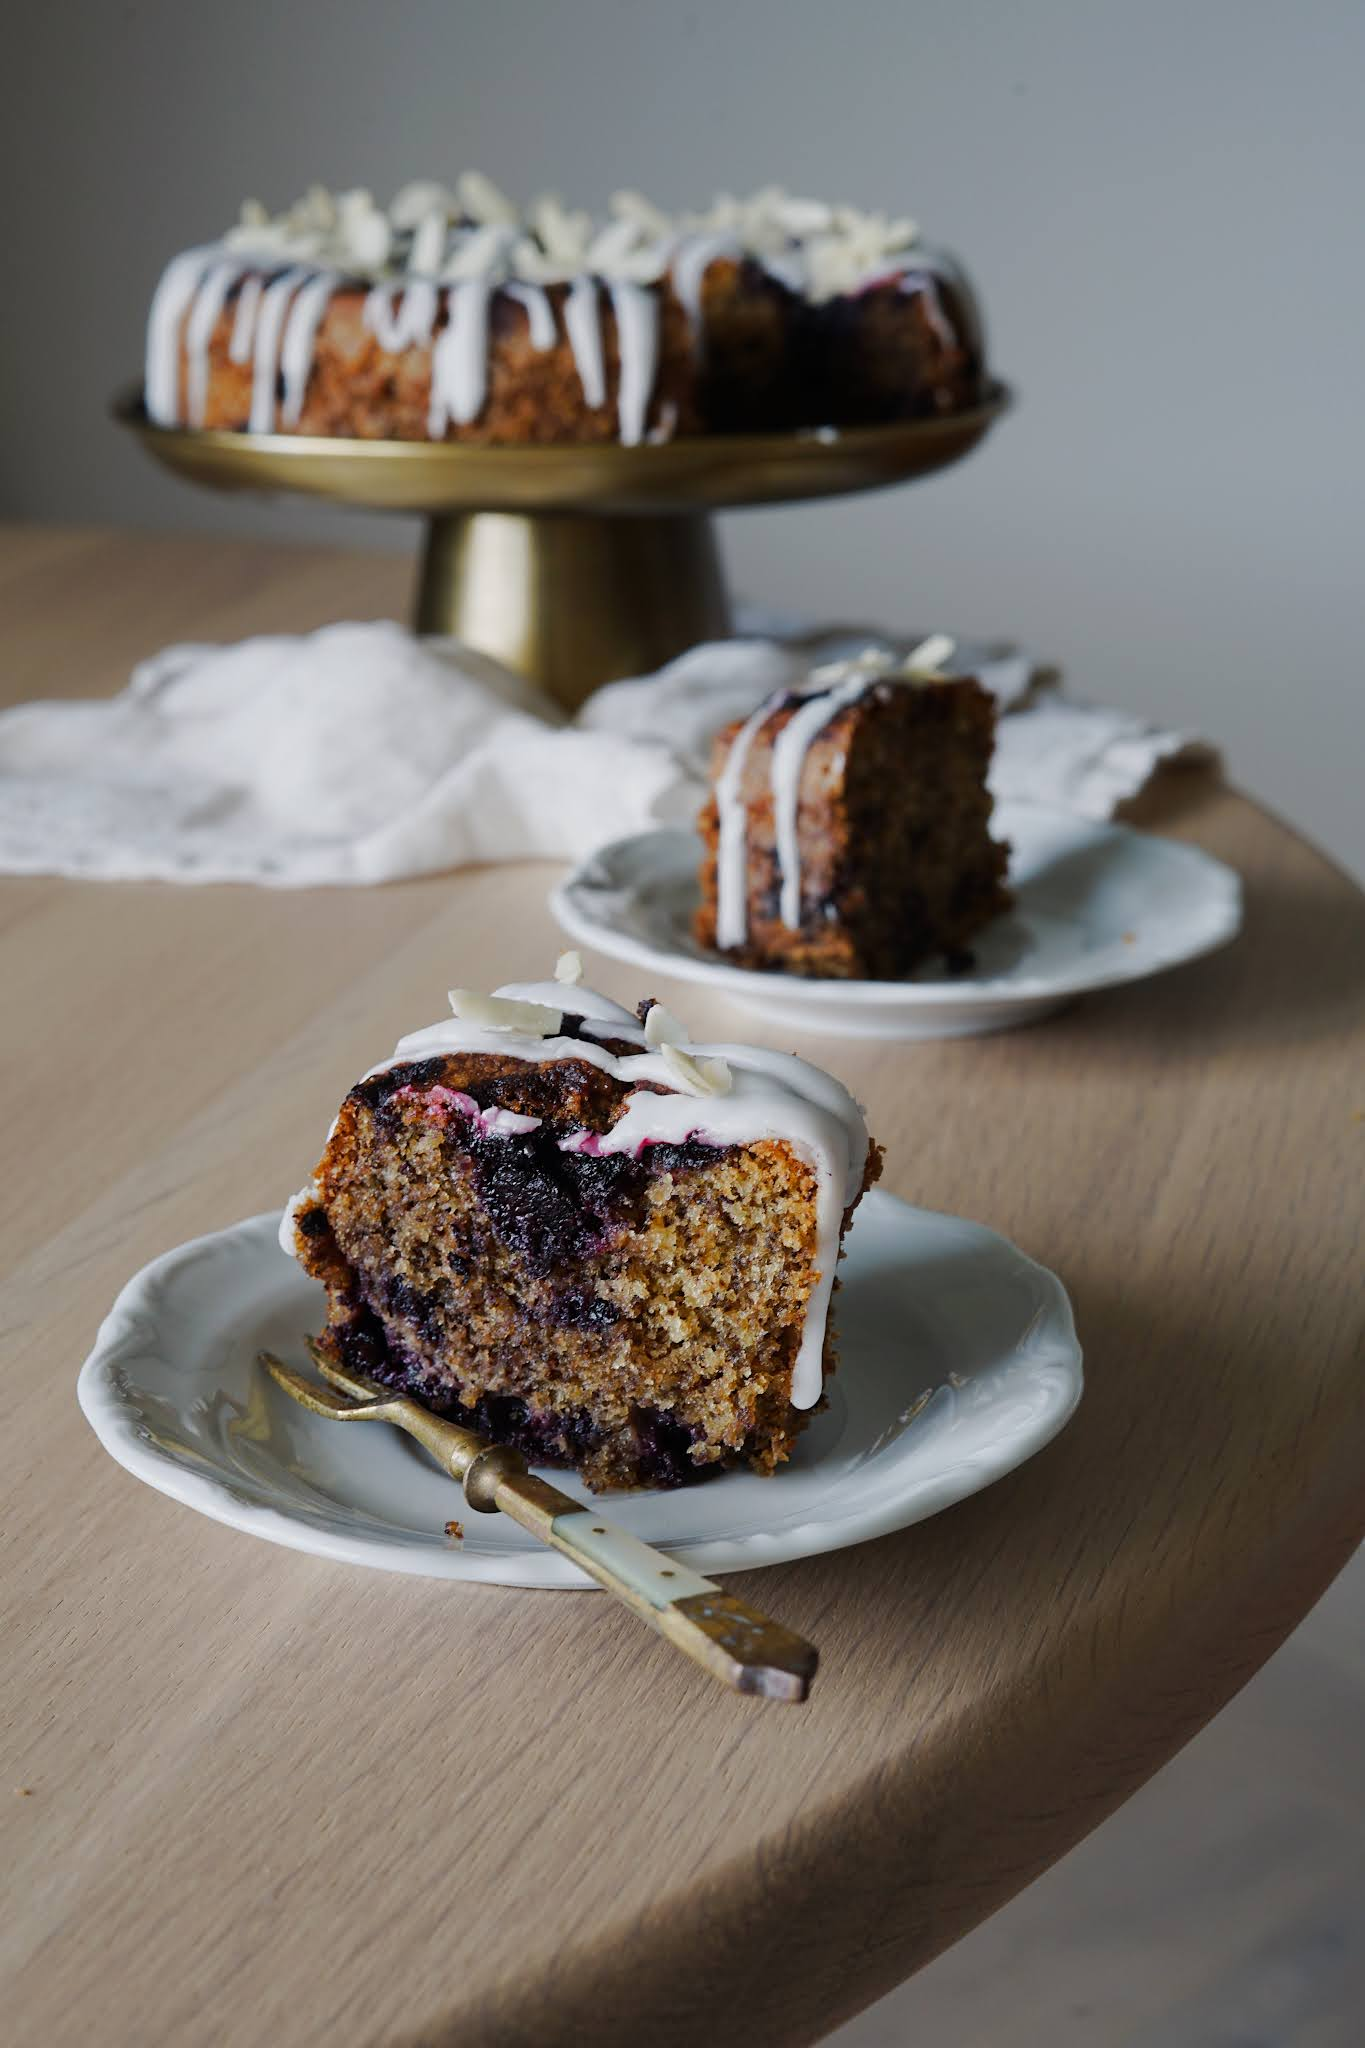 Wilgotne ciasto ucierane z owocami